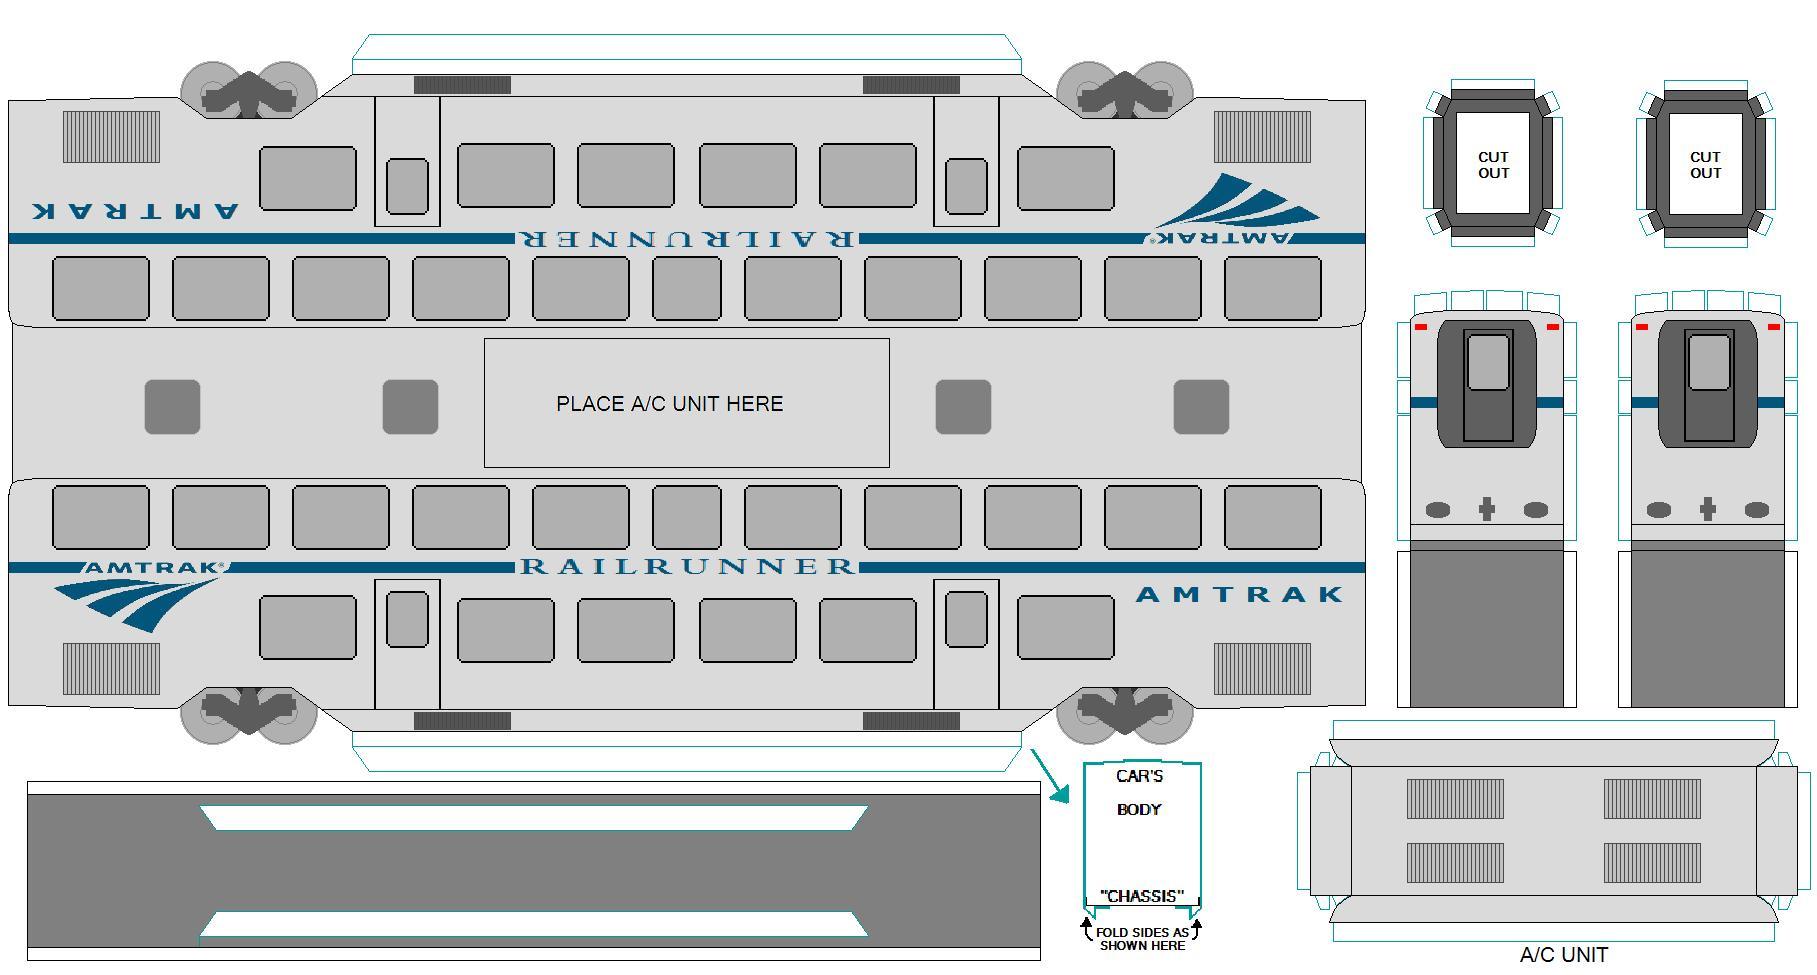 bi_level_train_car_Amtrak.PNG